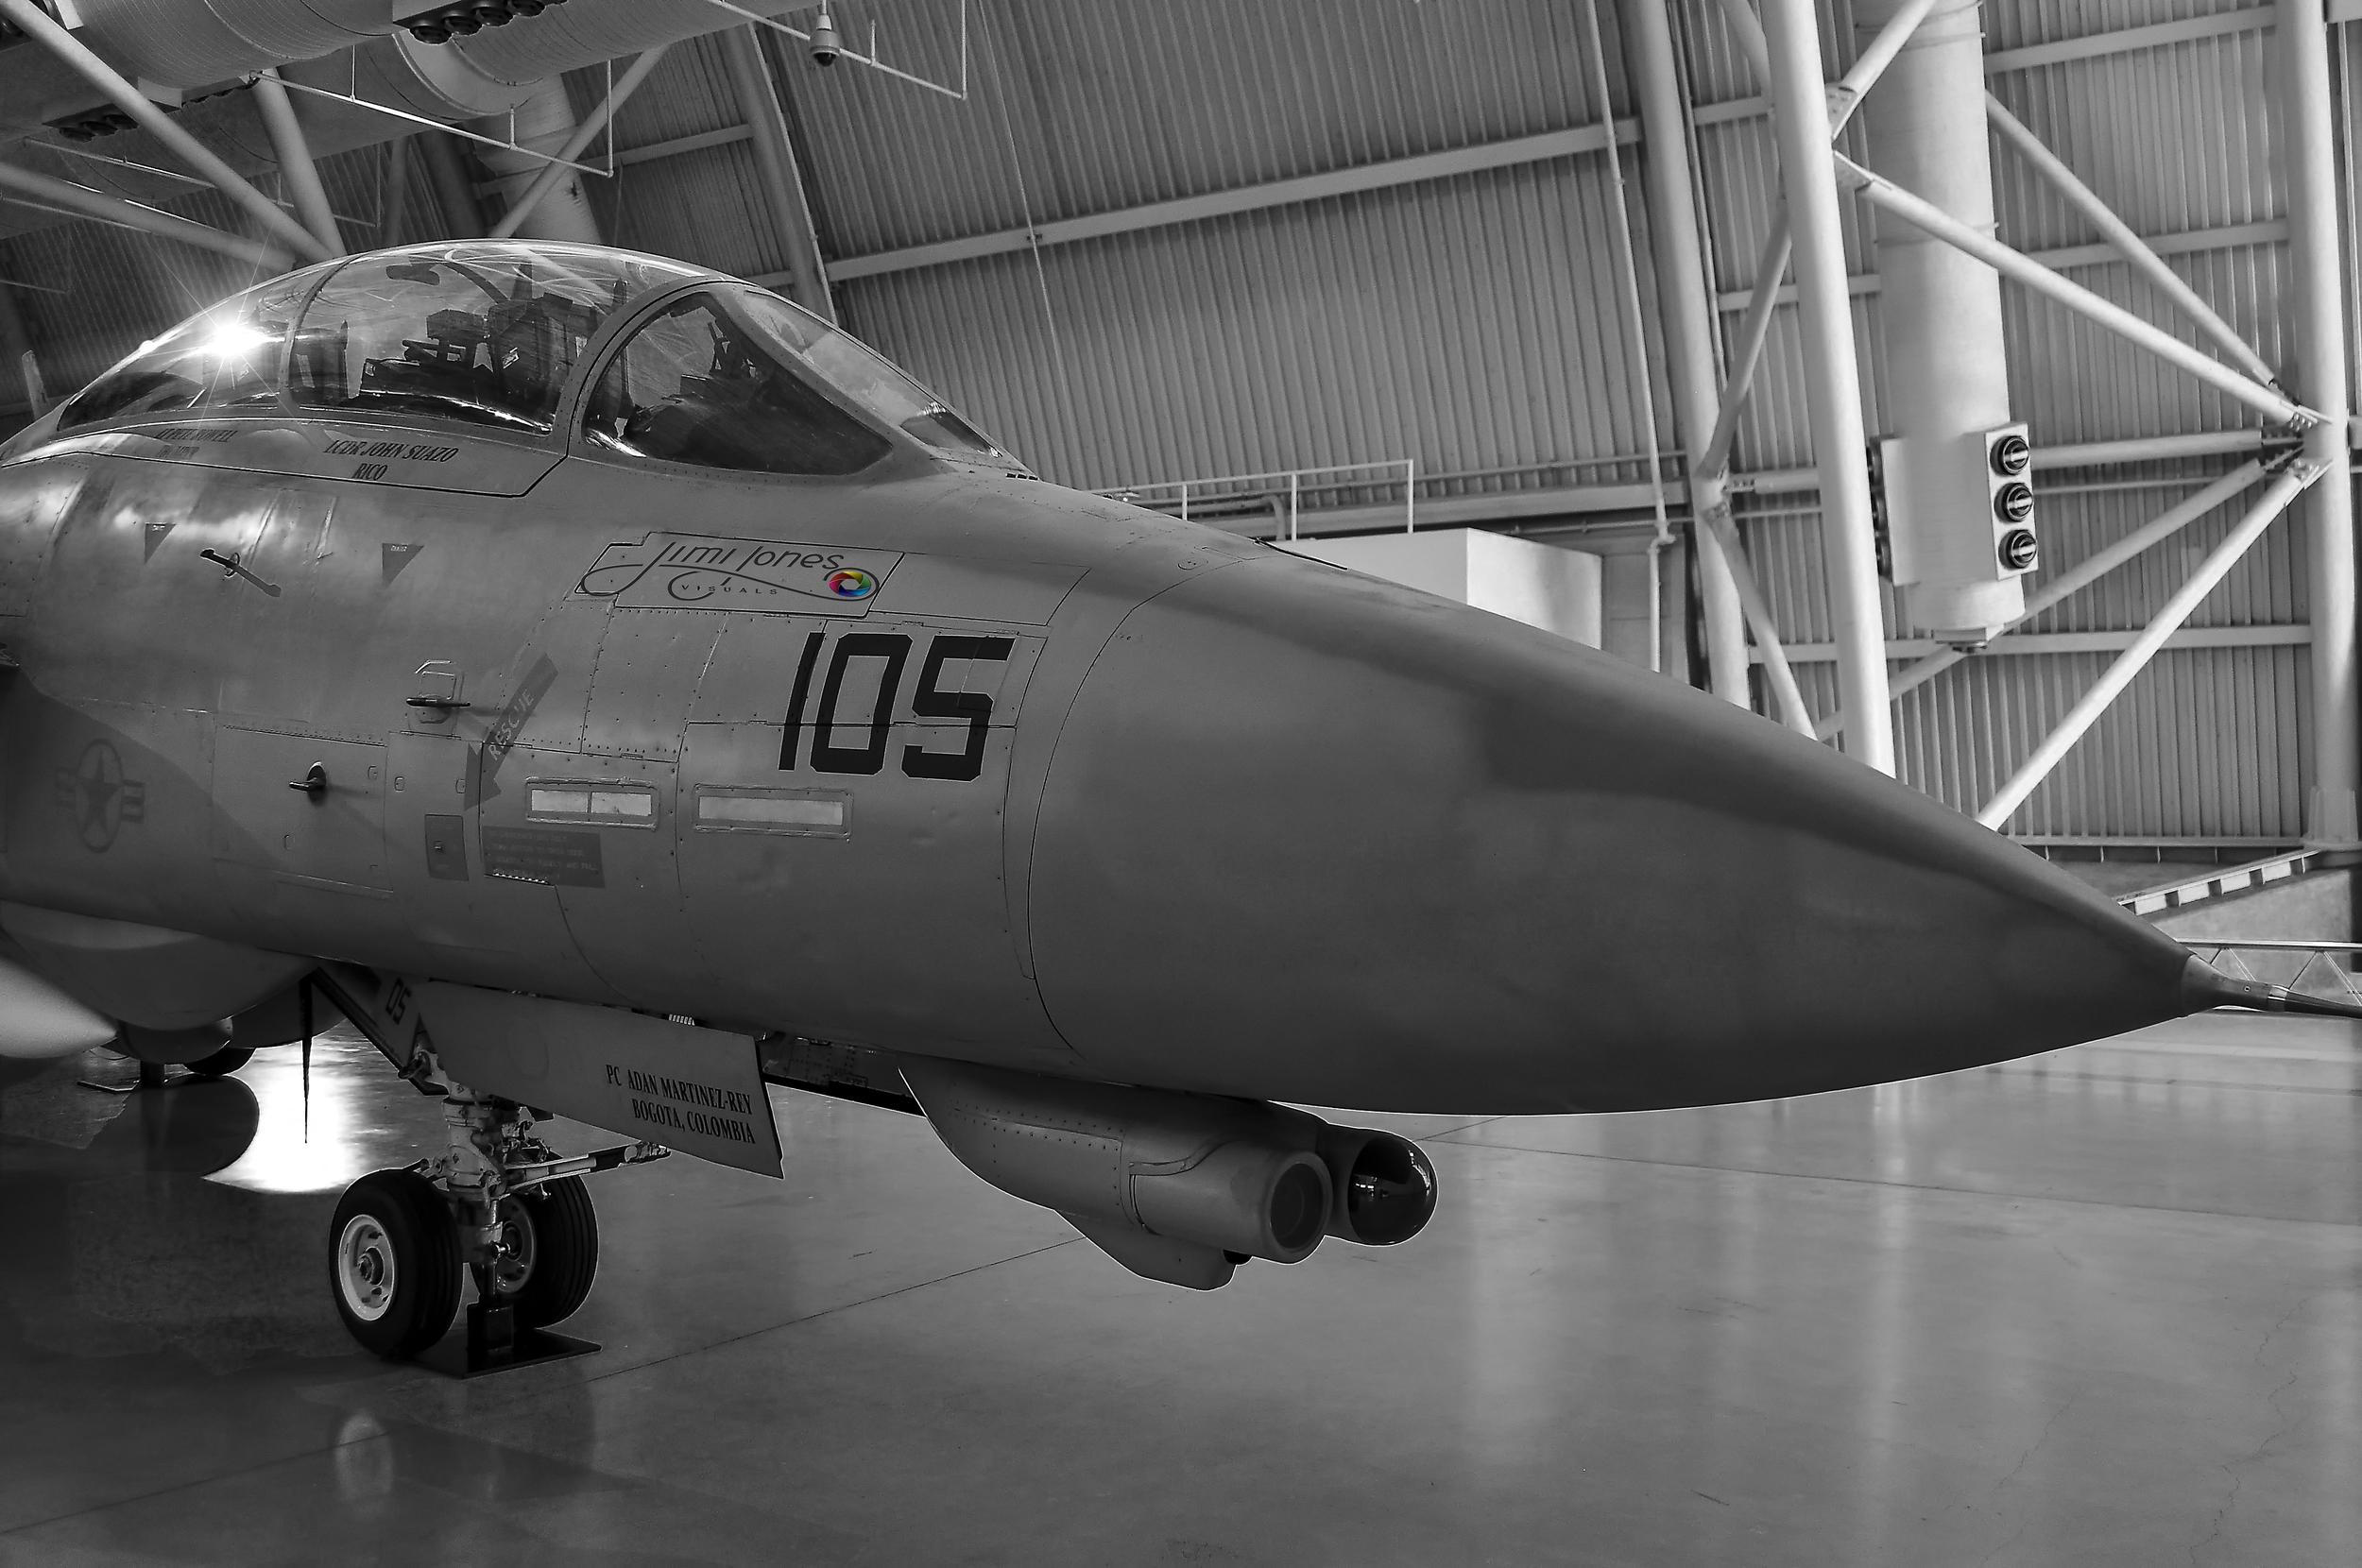 F-14 D (R) Tomcat in B&W                                                      BUY